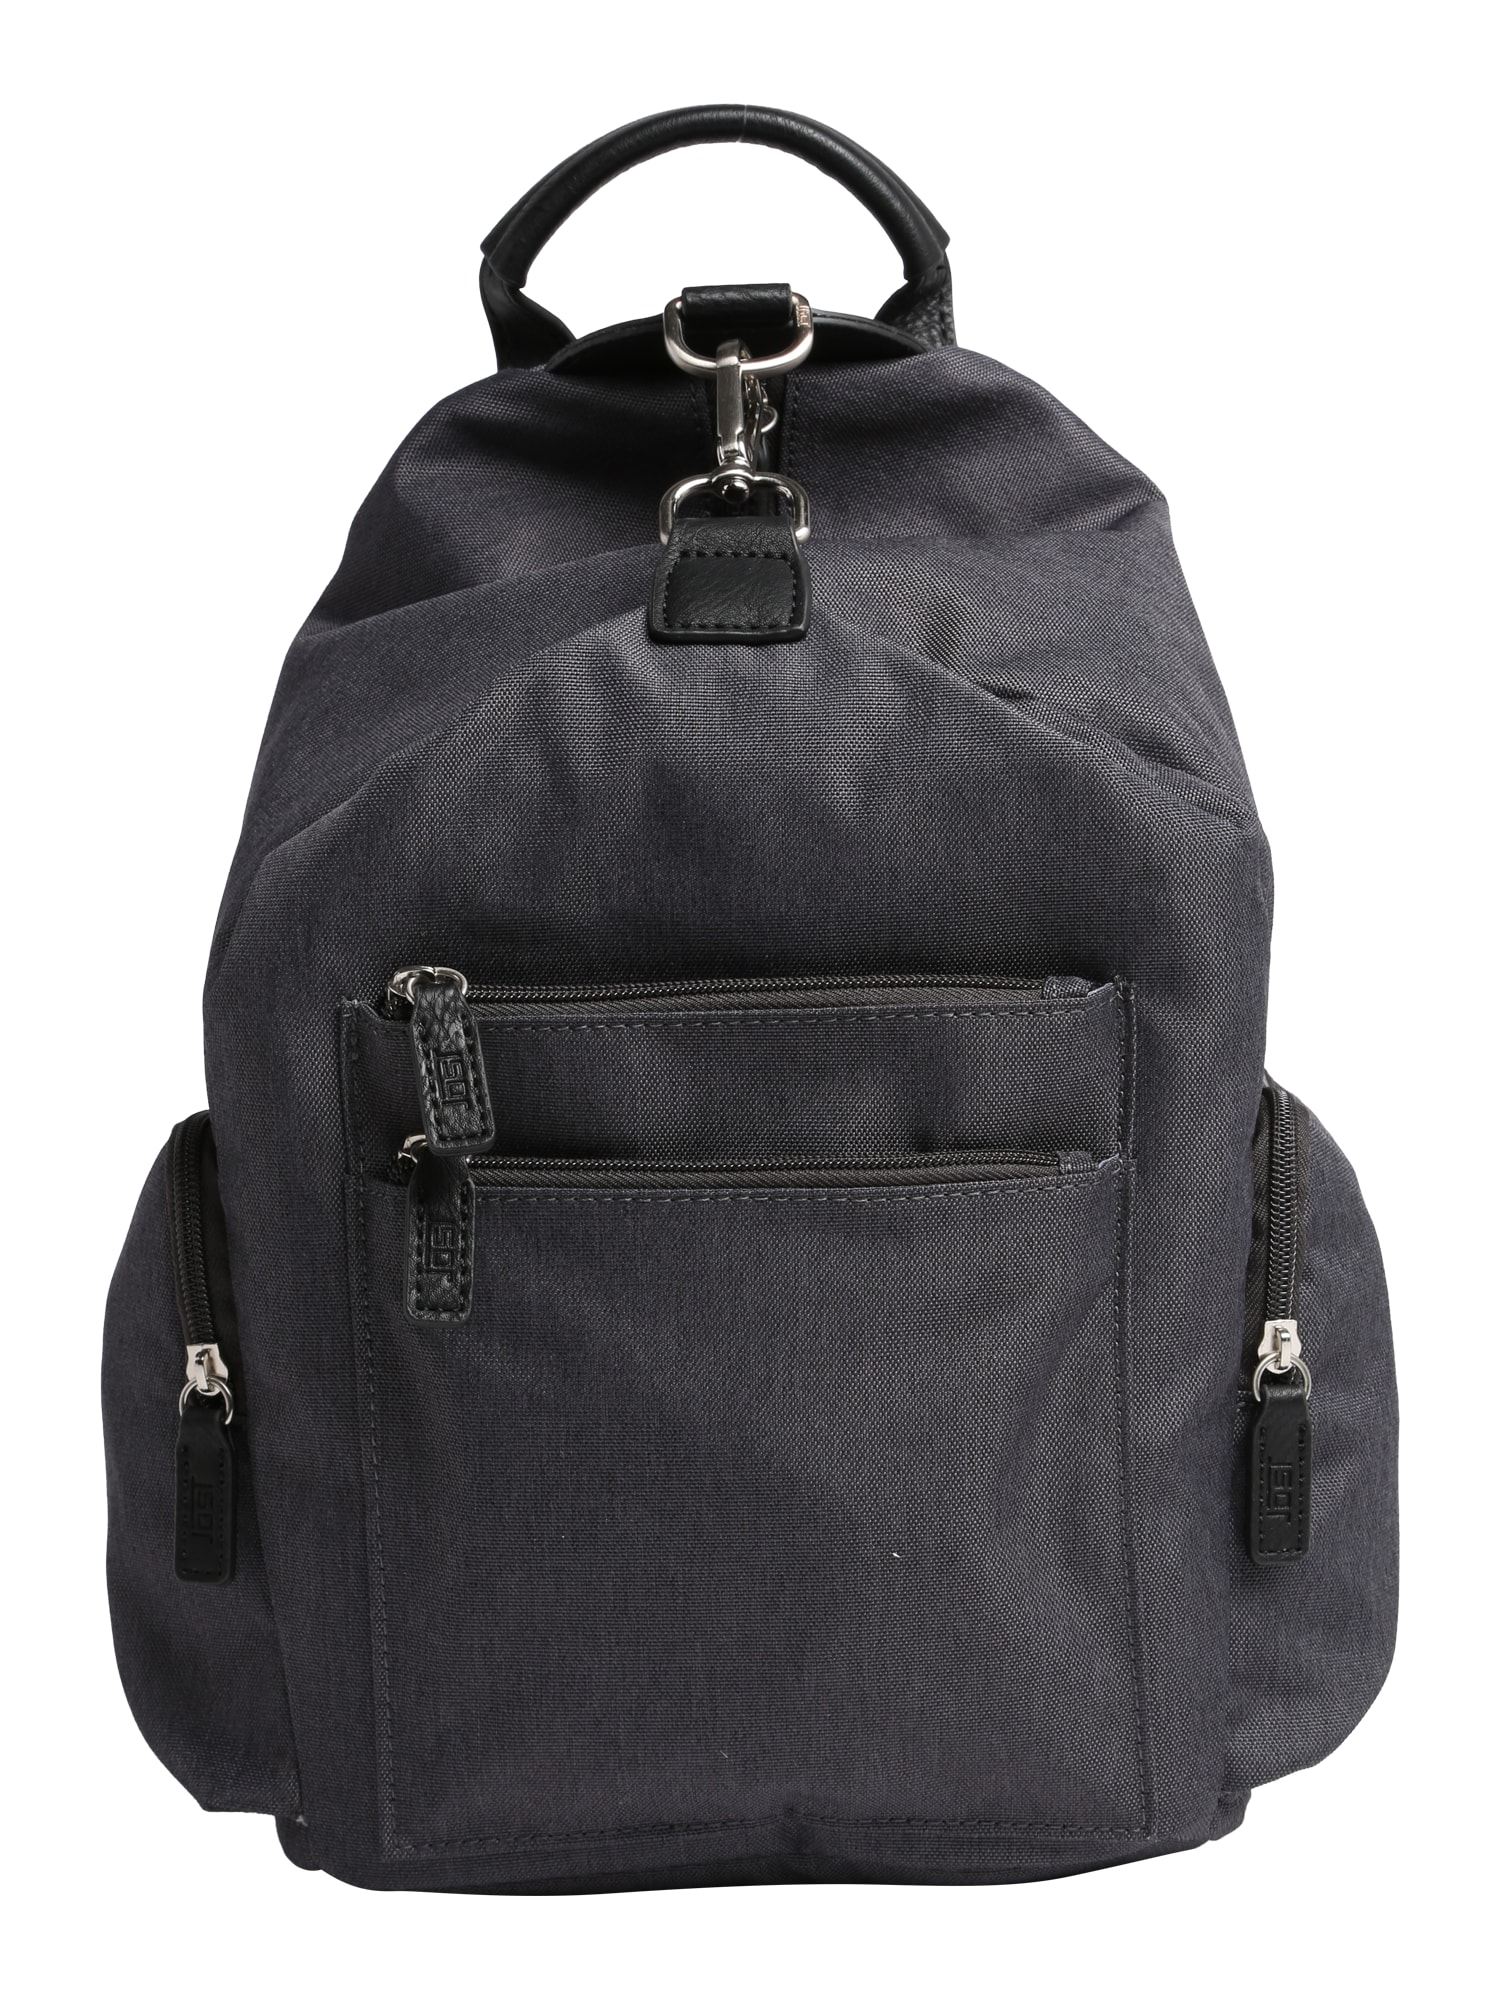 Batoh BERGEN Daybag Backpack tmavě šedá JOST